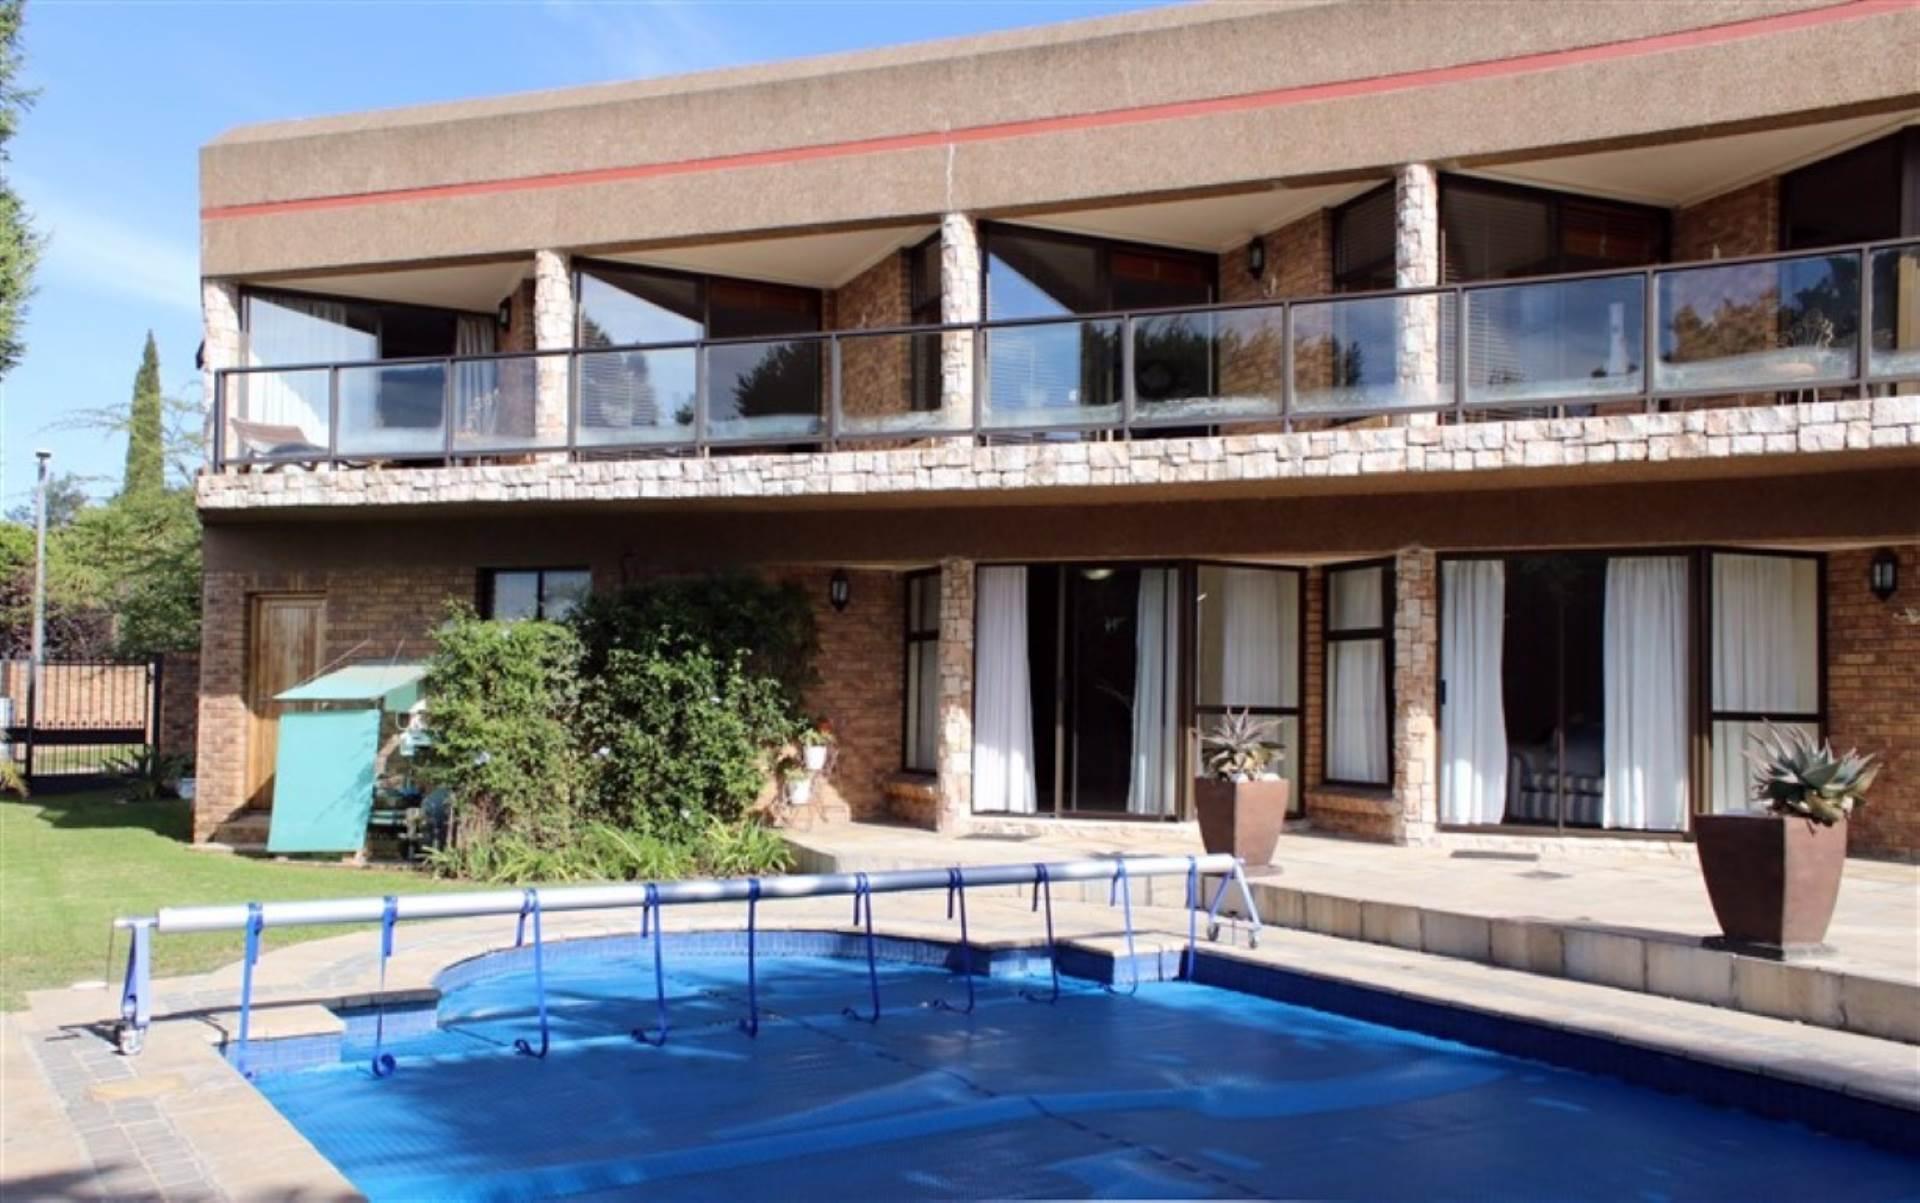 6 BedroomHouse For Sale In Everglen